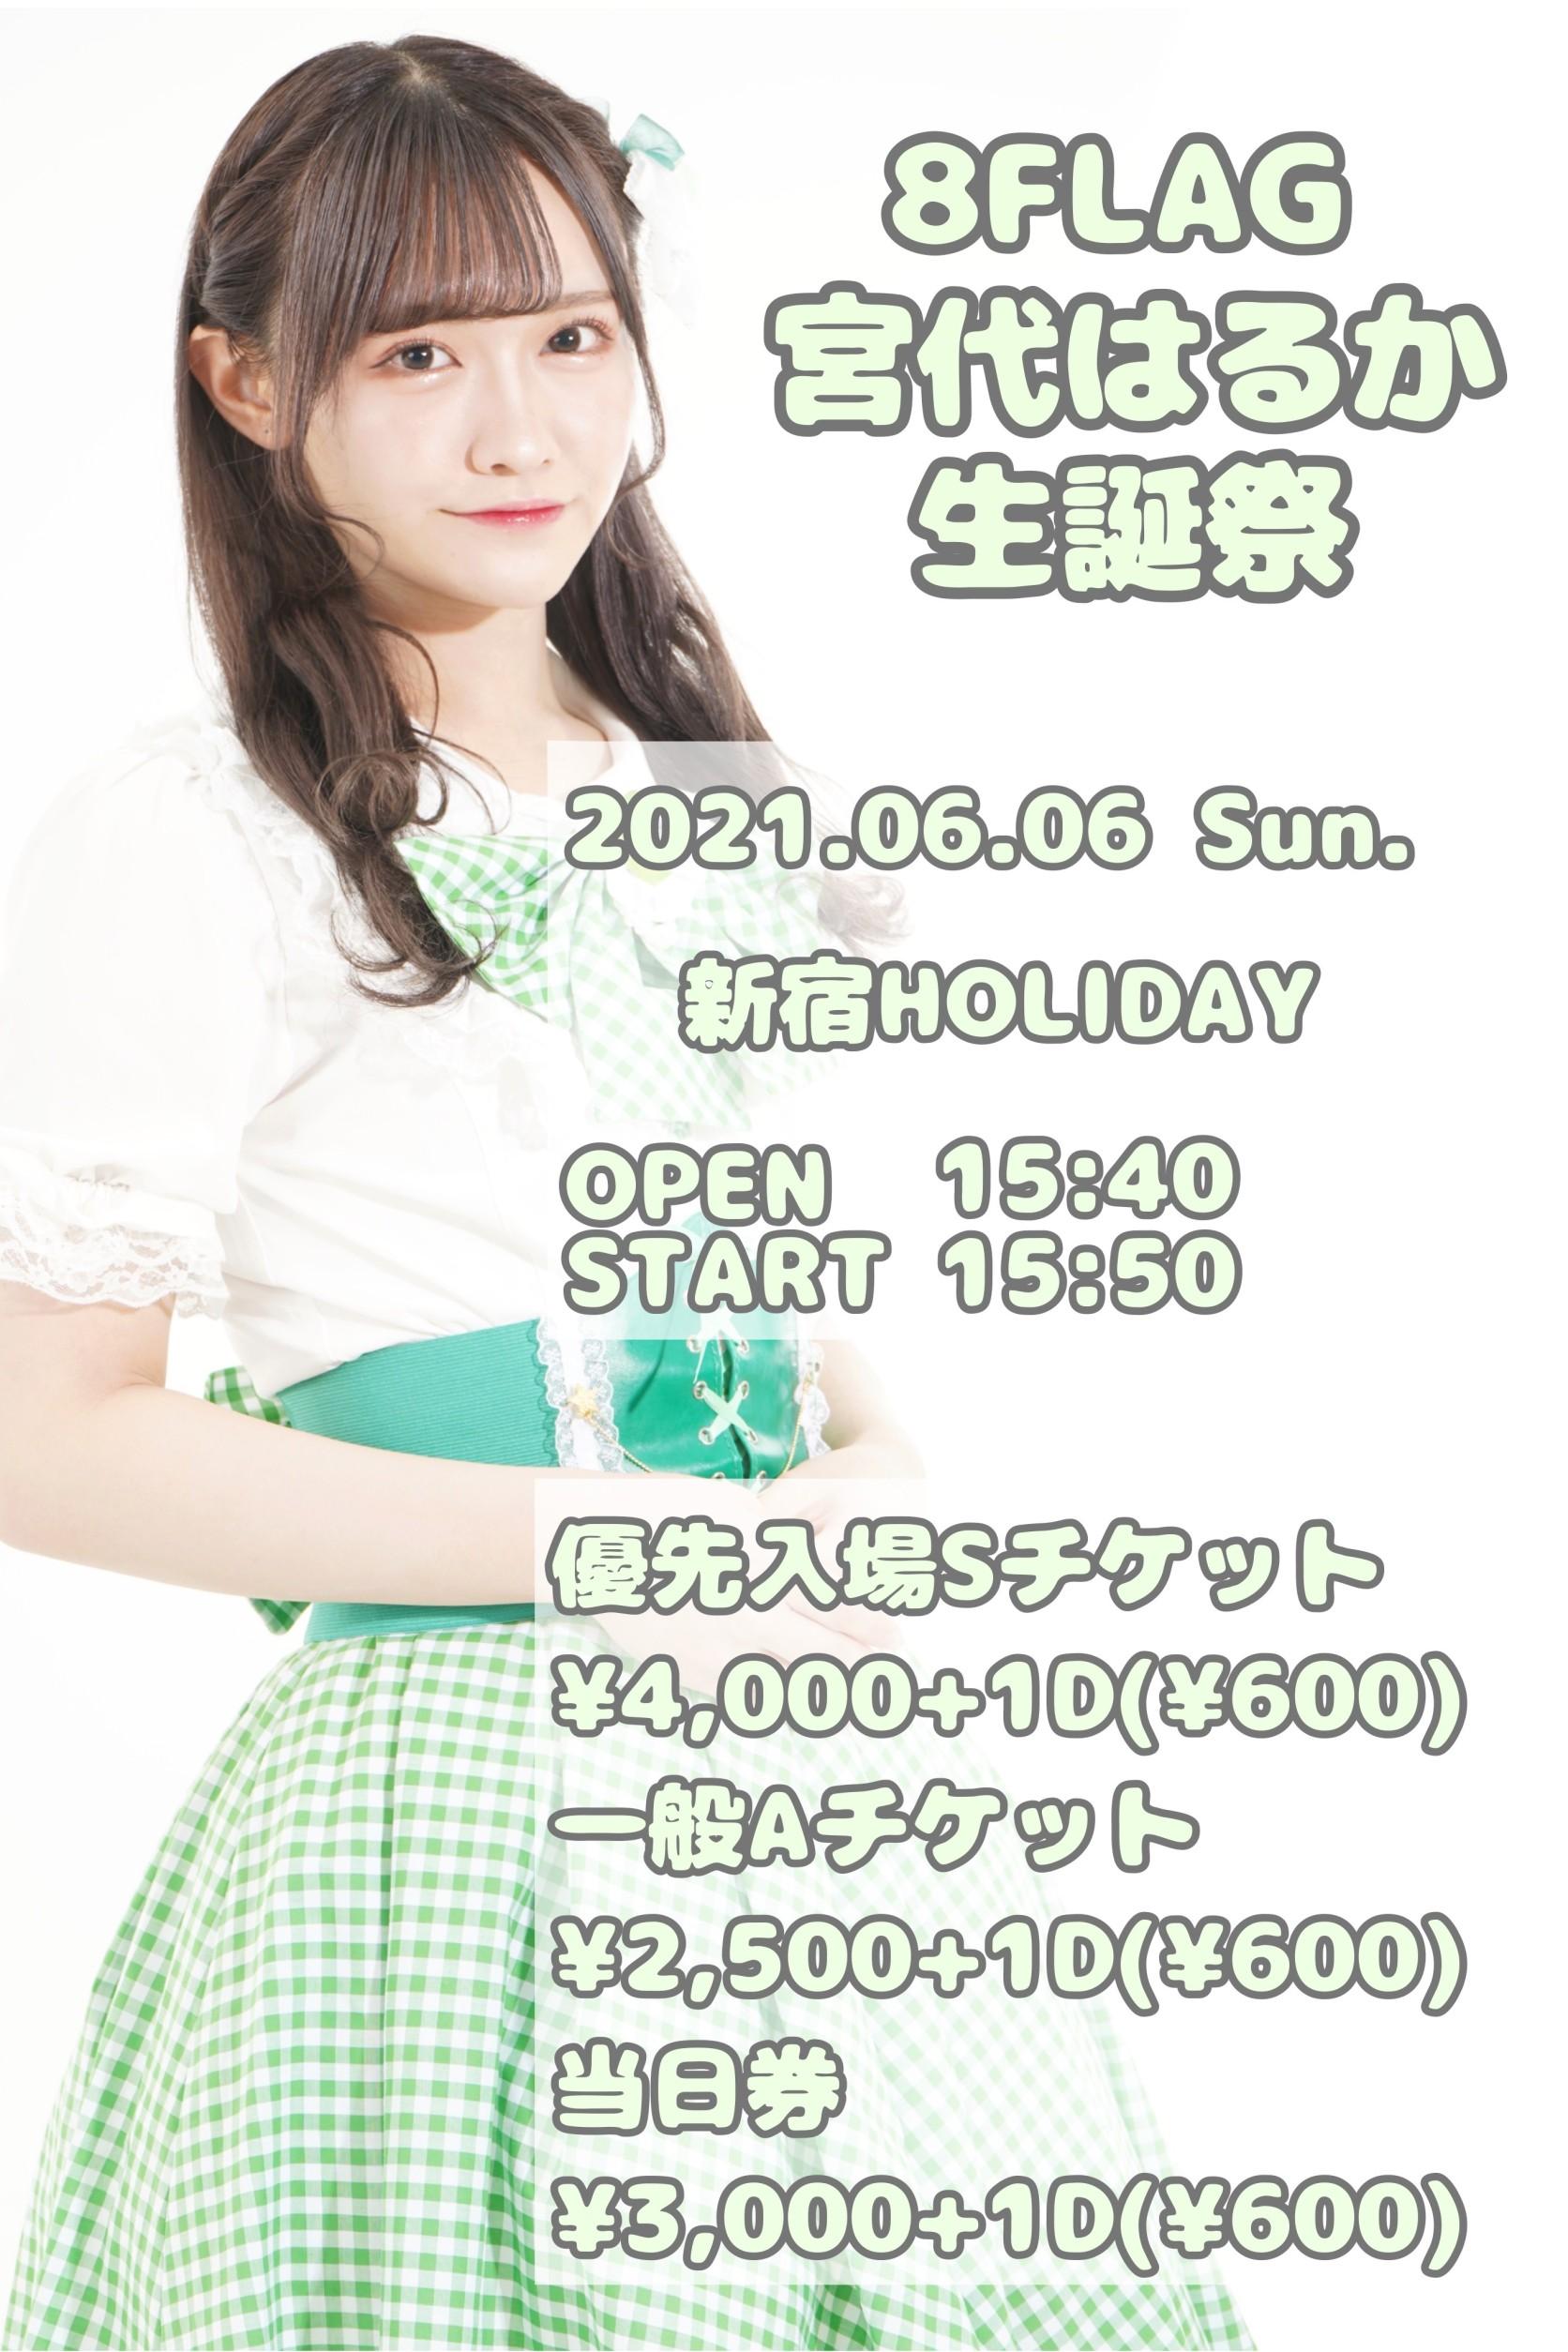 SKYZ IDOL PARTY PLUS 2部 〜8FLAG宮代はるか生誕祭〜